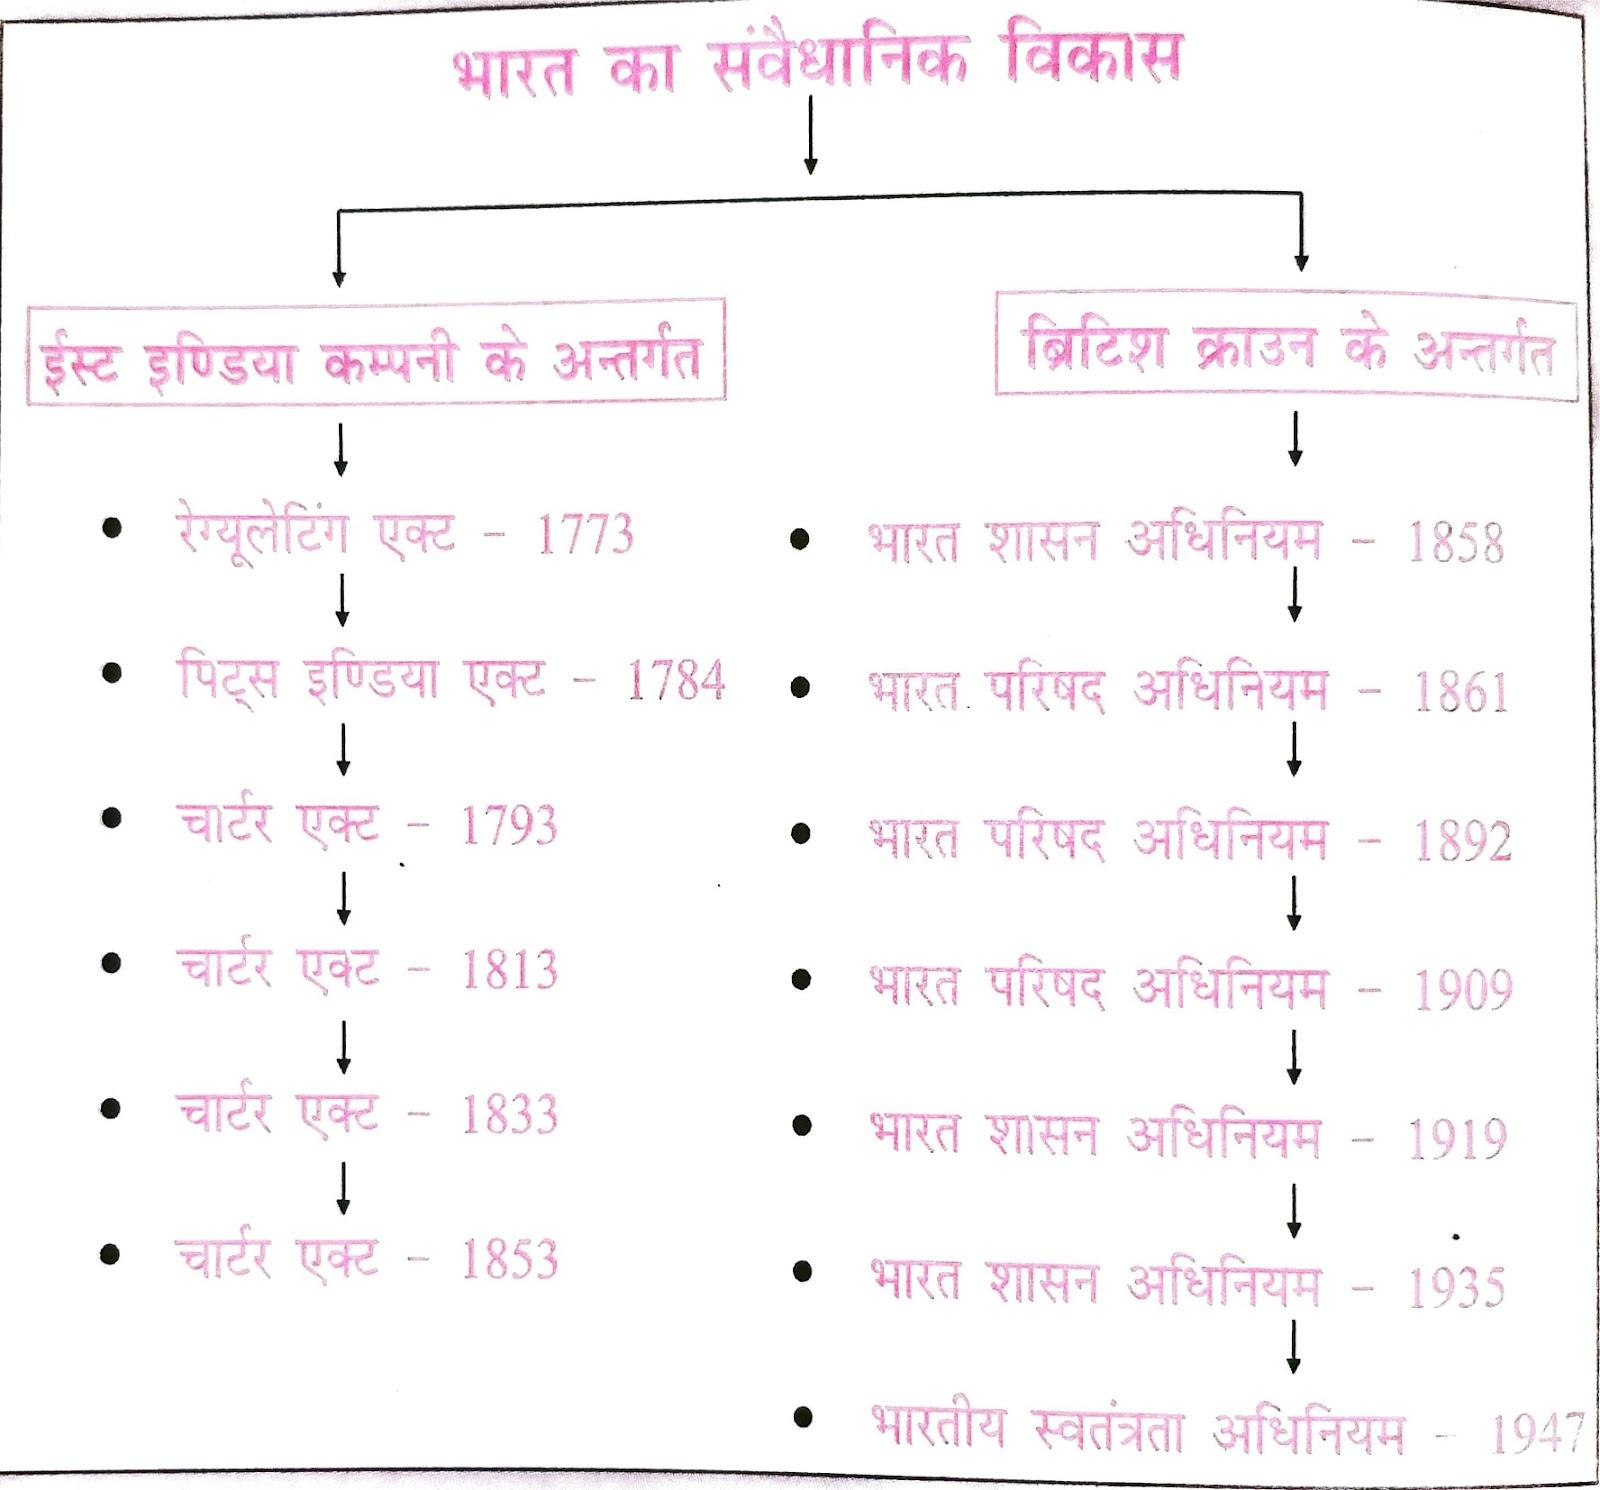 Constitutional Development of India भारत का संवैधानिक विकास